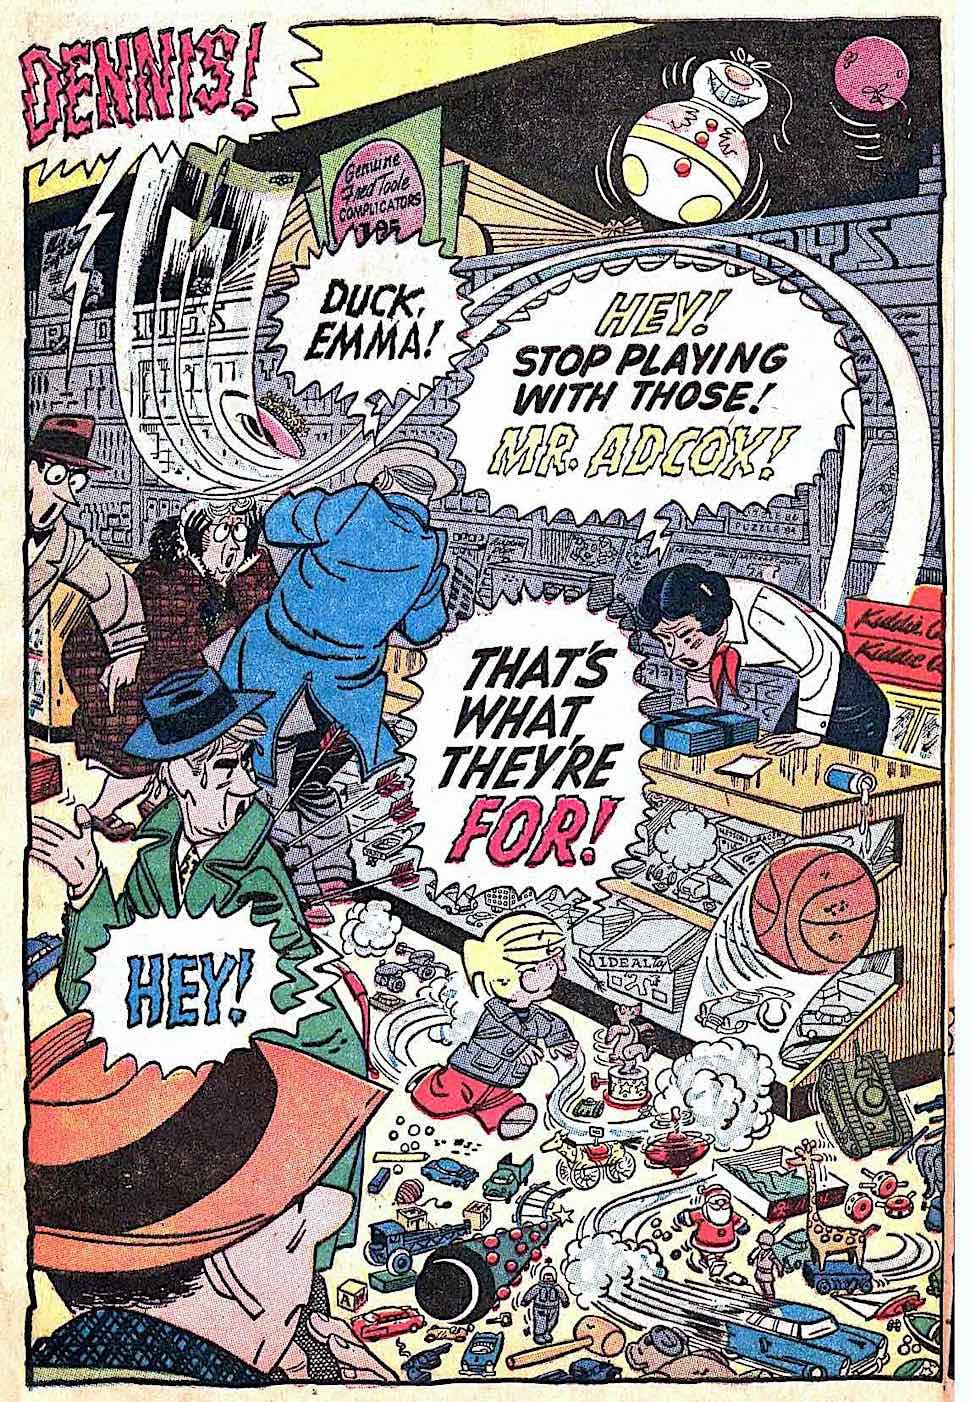 Dennis The Menace by Hank Ketcham 1956, Dennis runs wild in a toy store